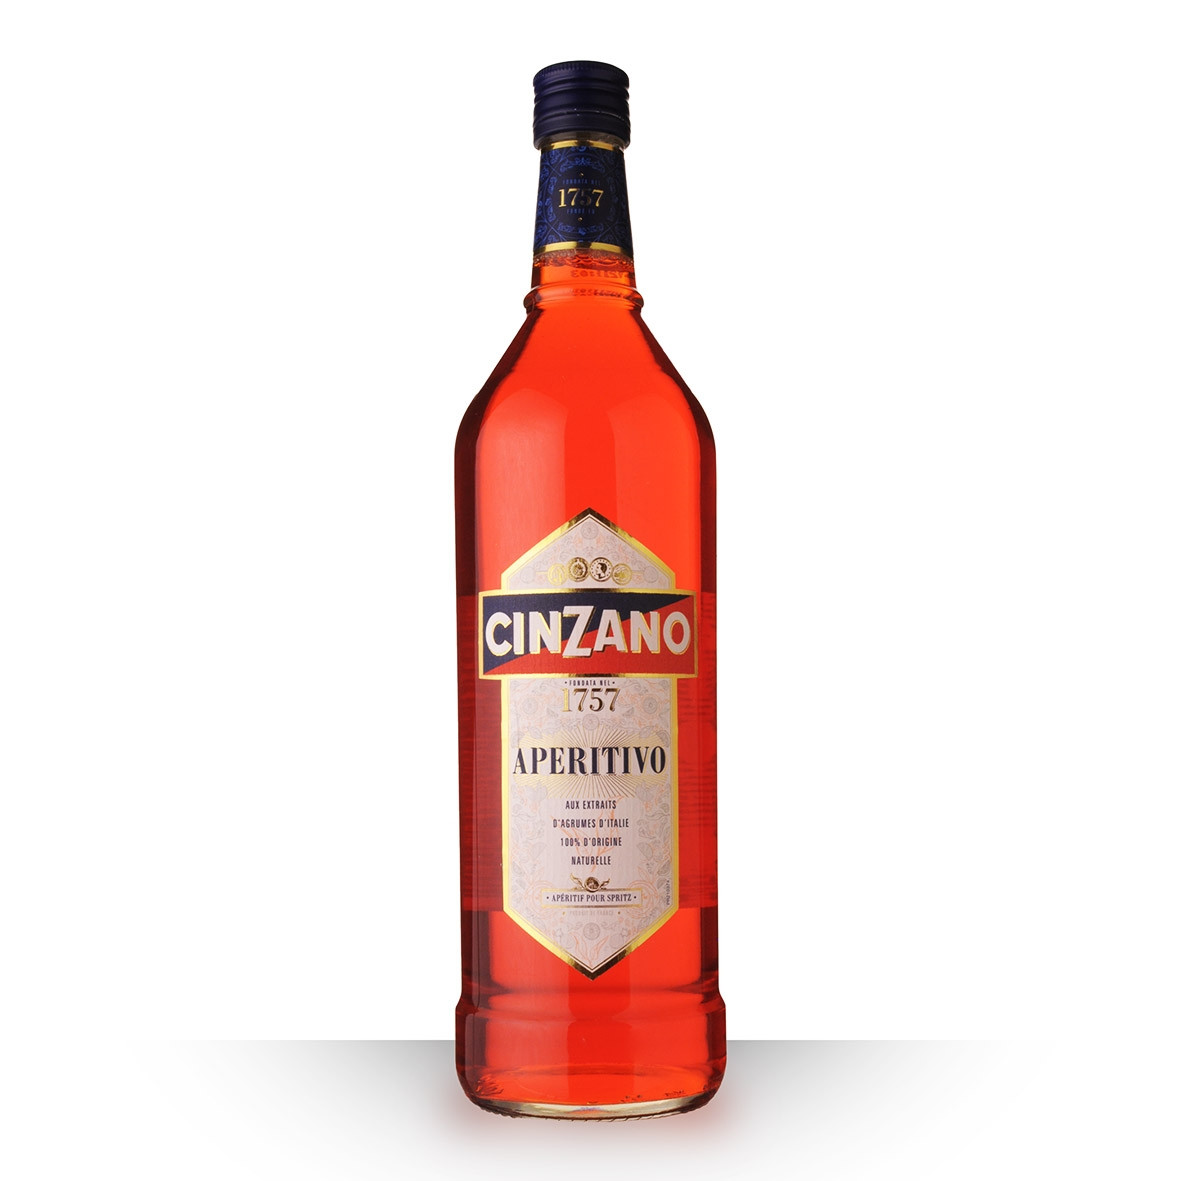 Vermouth Cinzano Aperitivo 100cl www.odyssee-vins.com